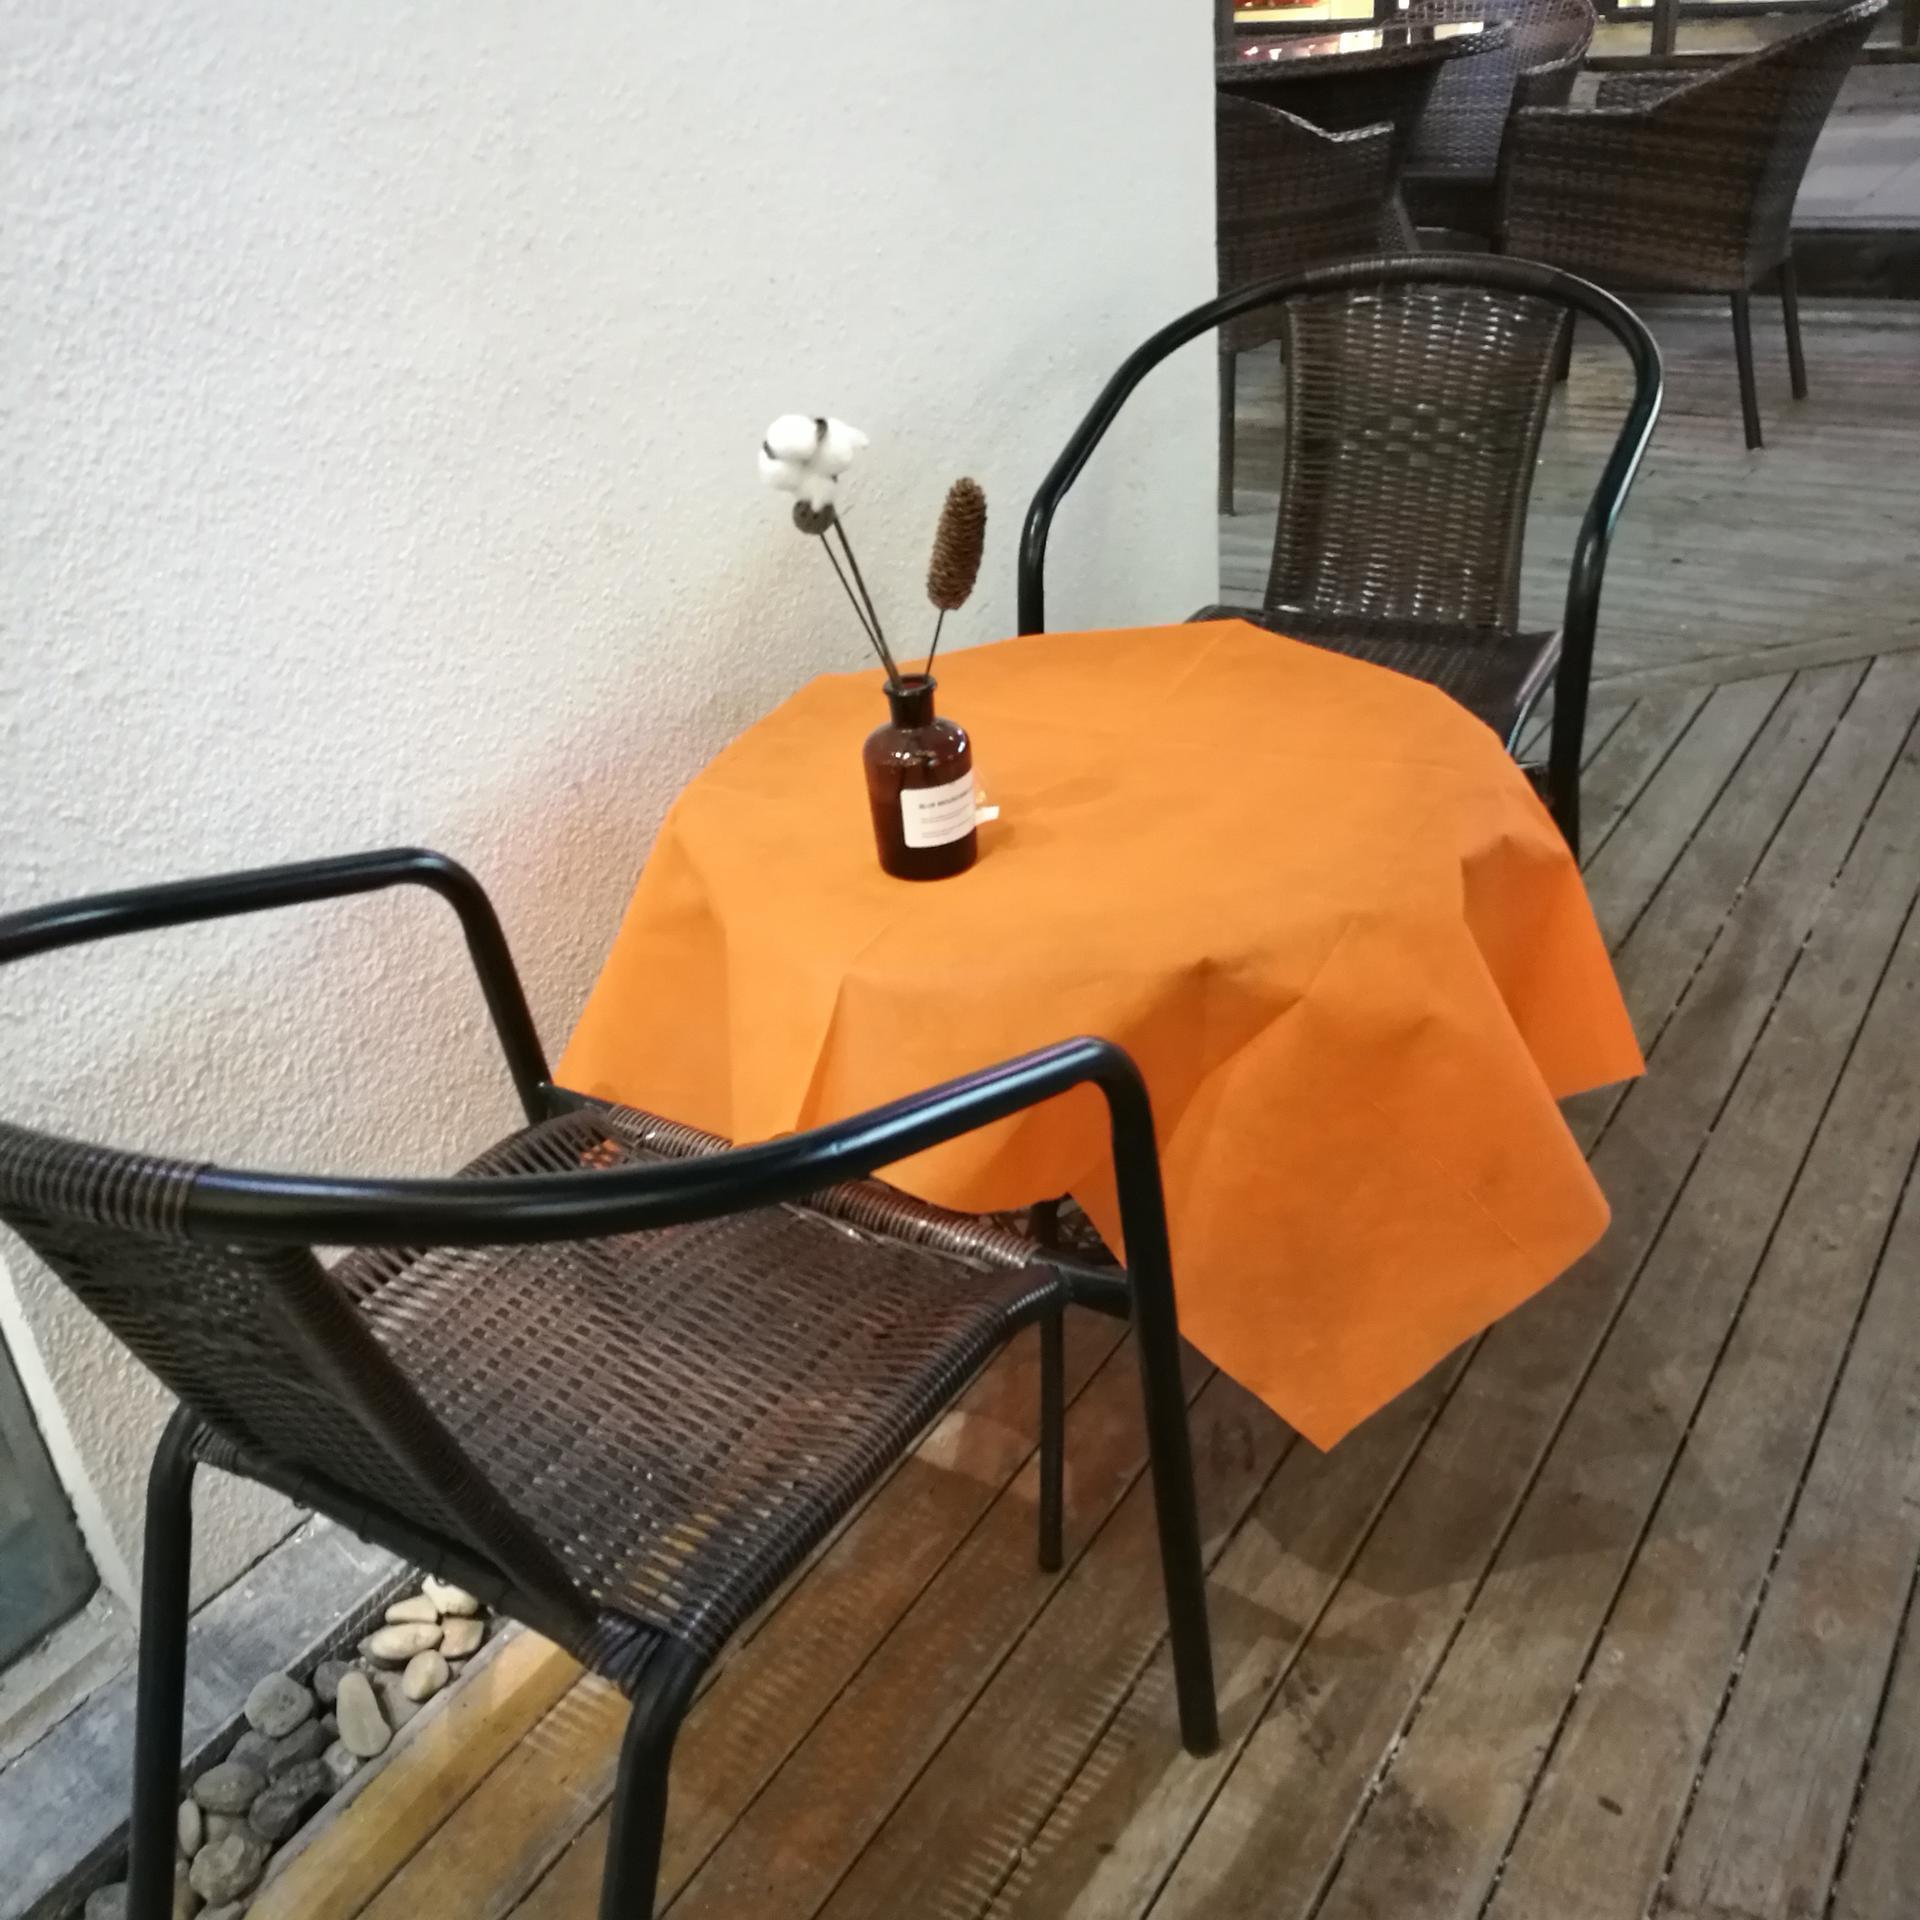 disposable non woven fabric tablecloth roll non woven table covers